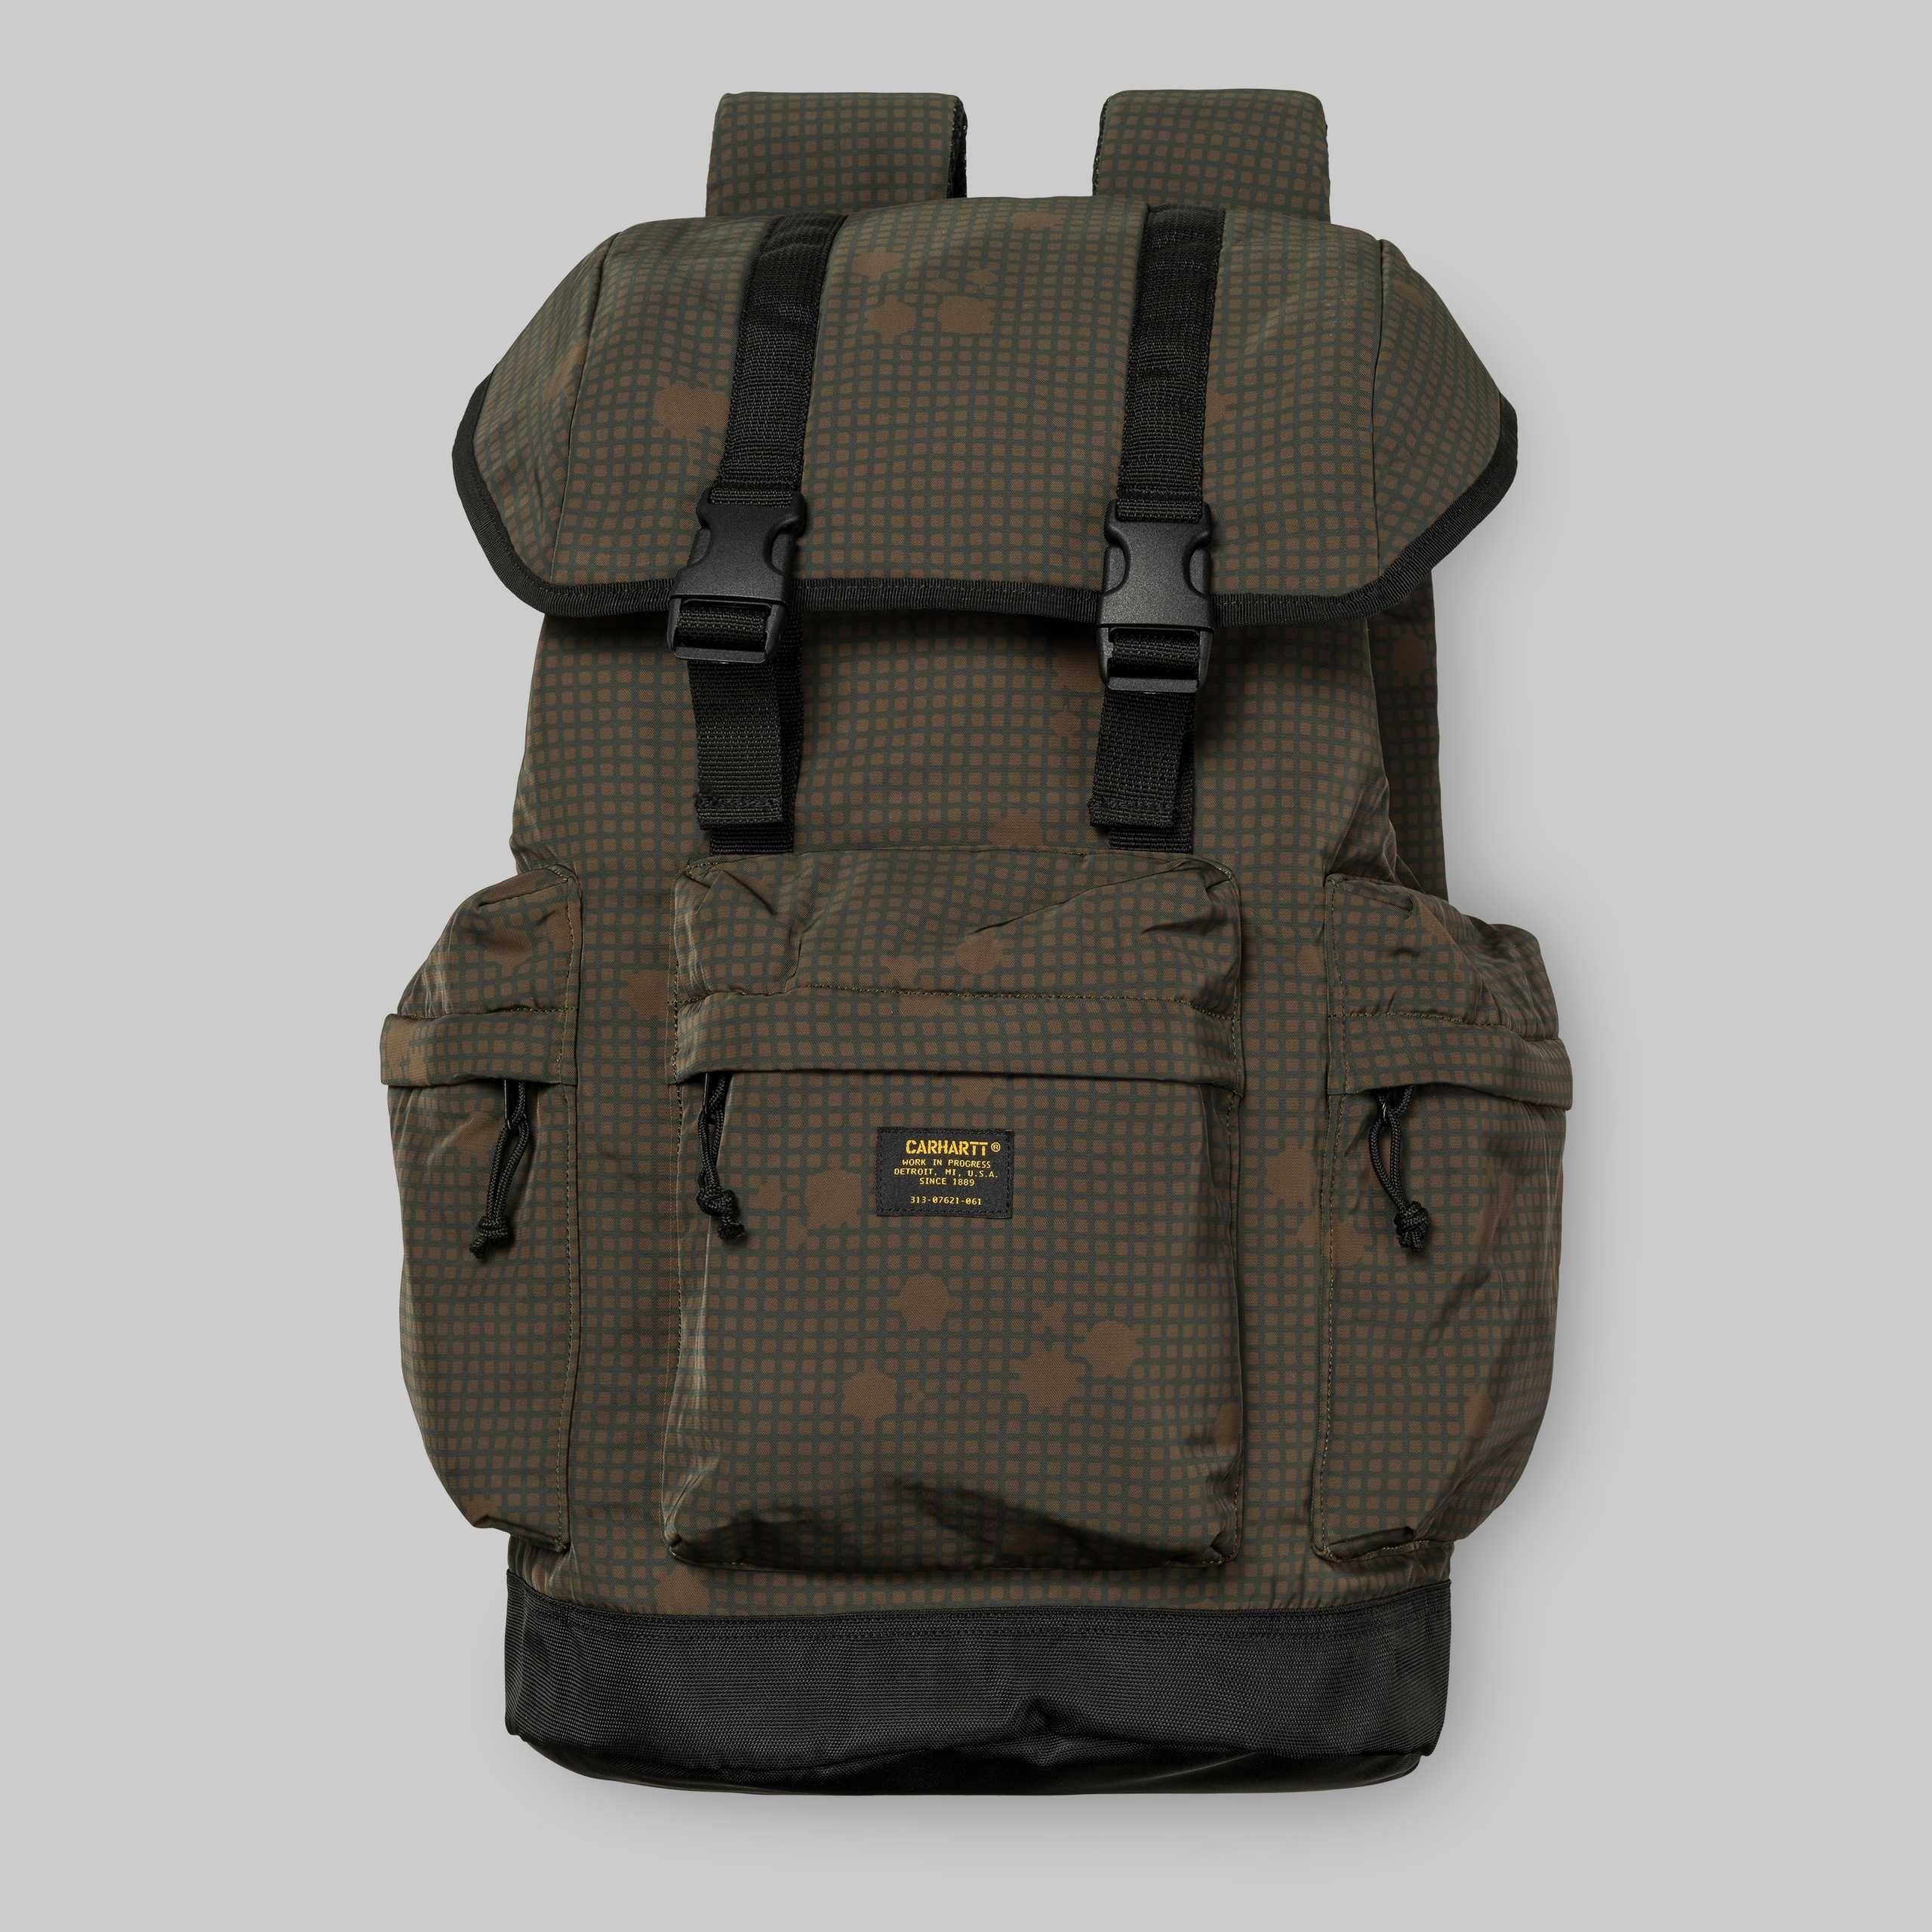 4a3f25b451 Carhartt WIP Military Backpack | carhartt-wip.com | Product ...